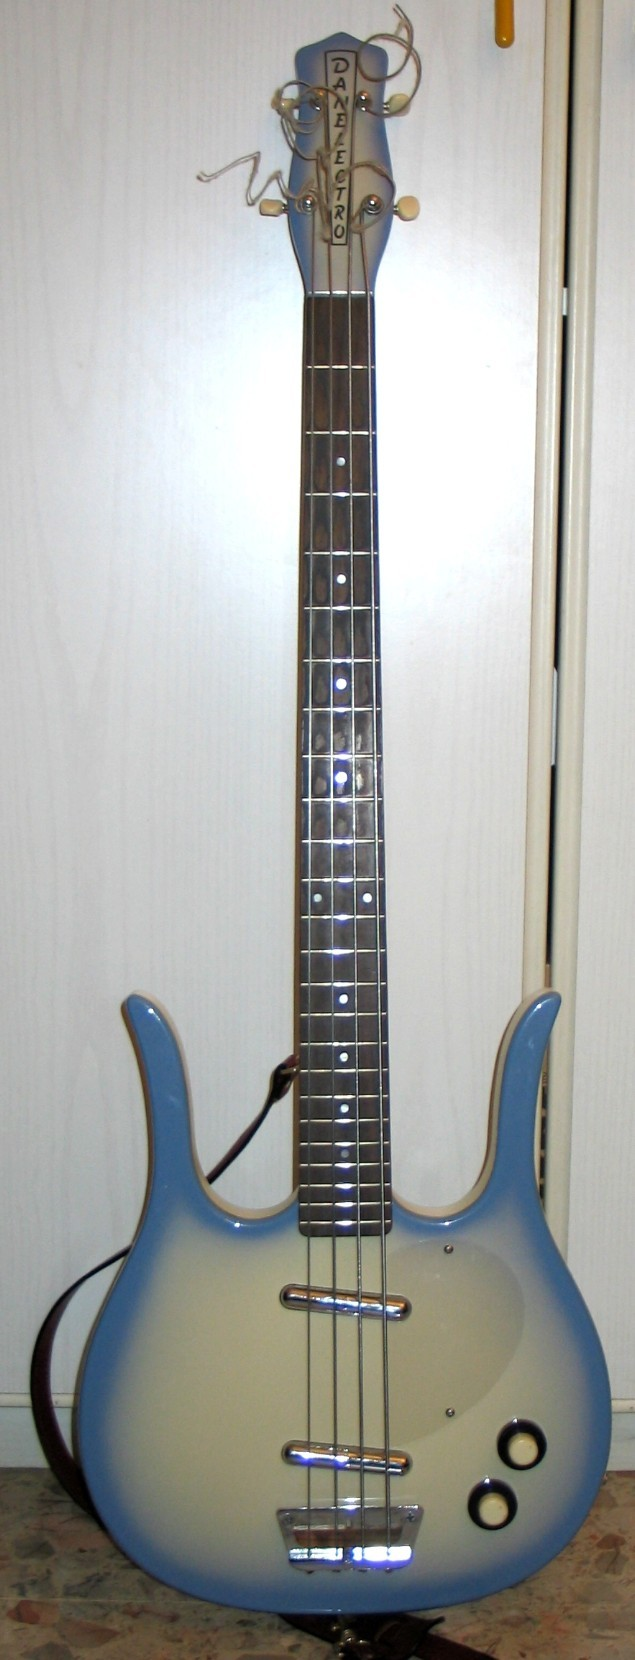 short scale basses-danelectro_longhorn_bass_blue_burst_rifflessi-jpg